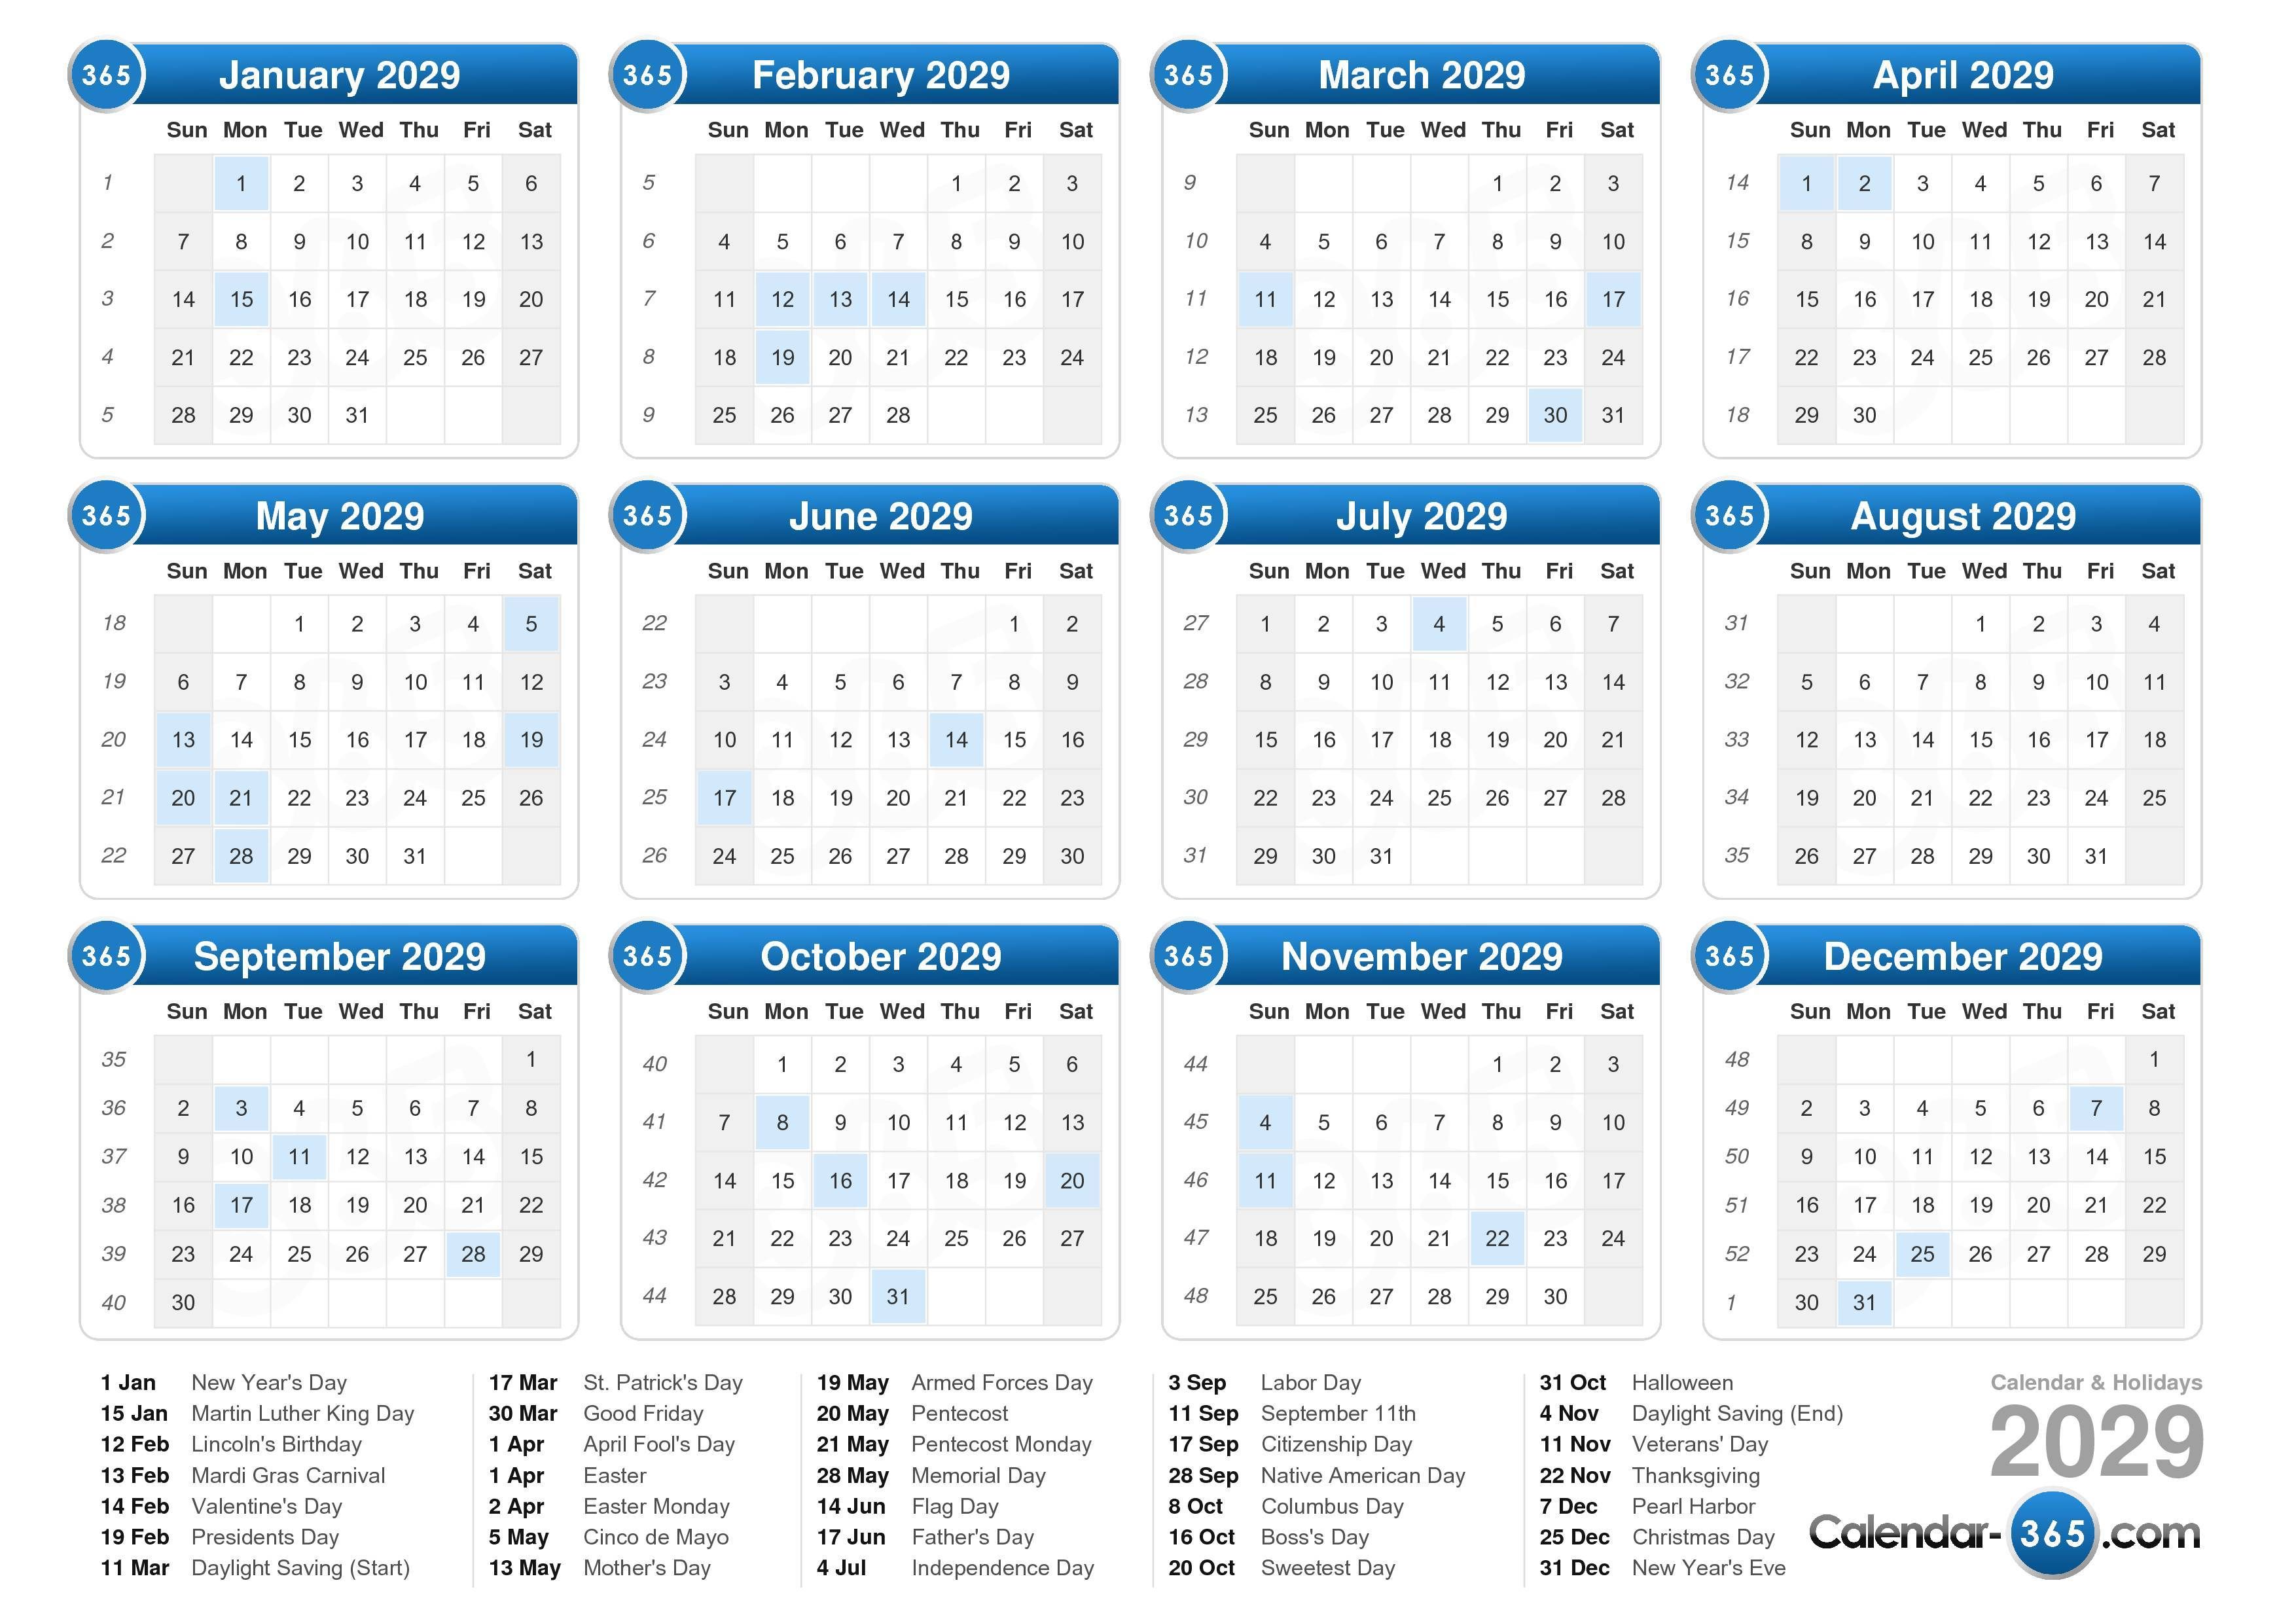 ... calendar with holidays landscape format 1 page 2029 calendar 813 8 423